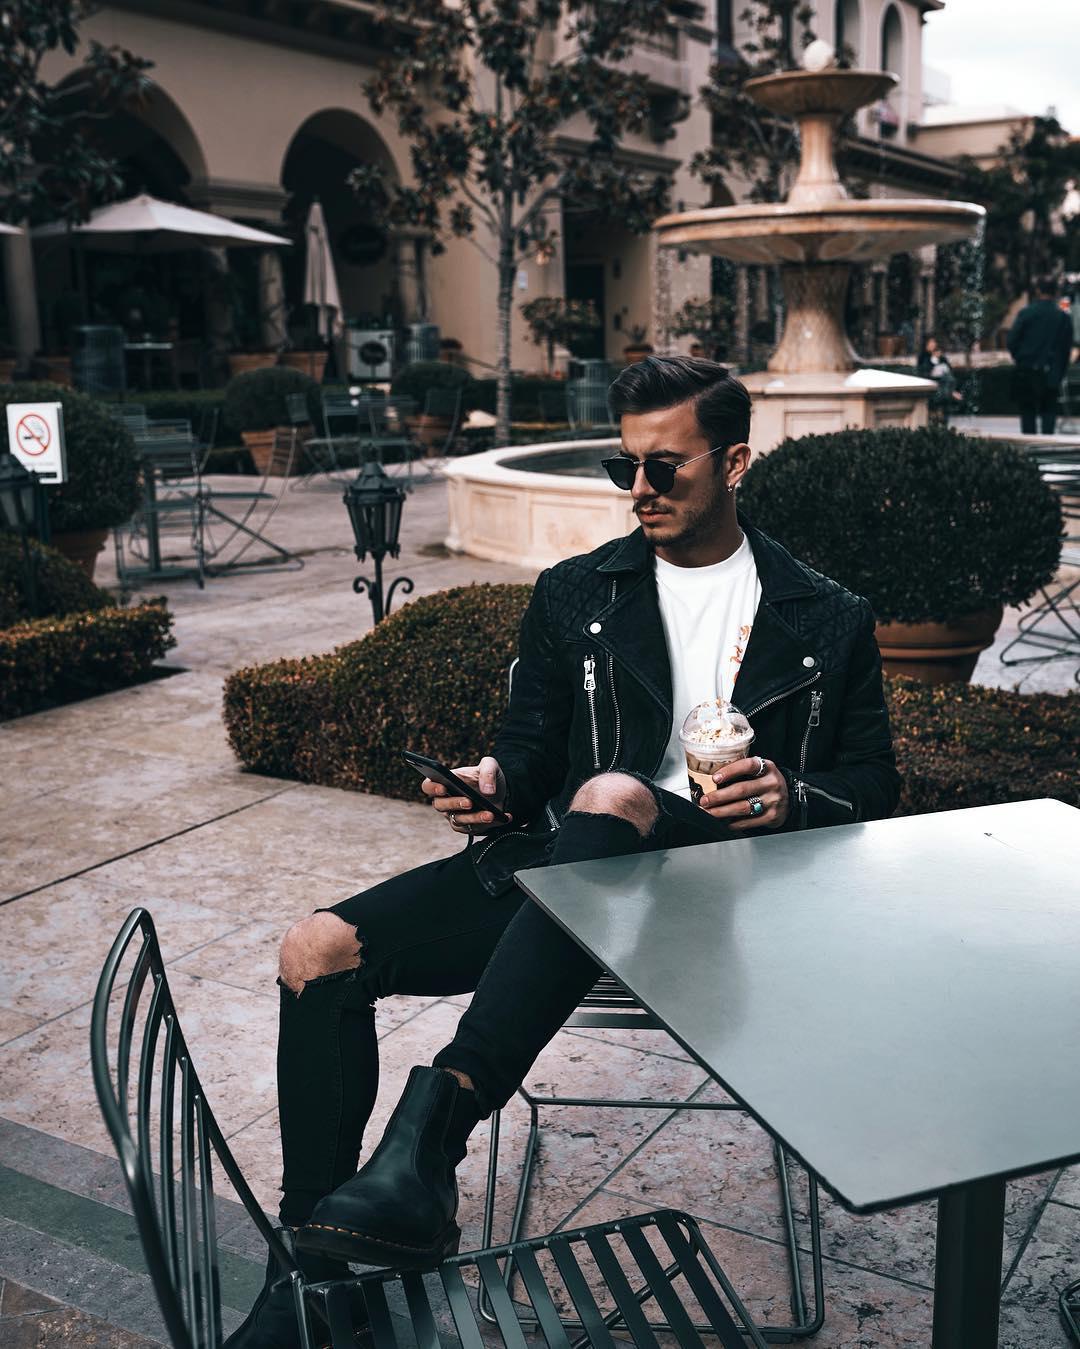 leather jacket kleding feestdagen MAN MAN